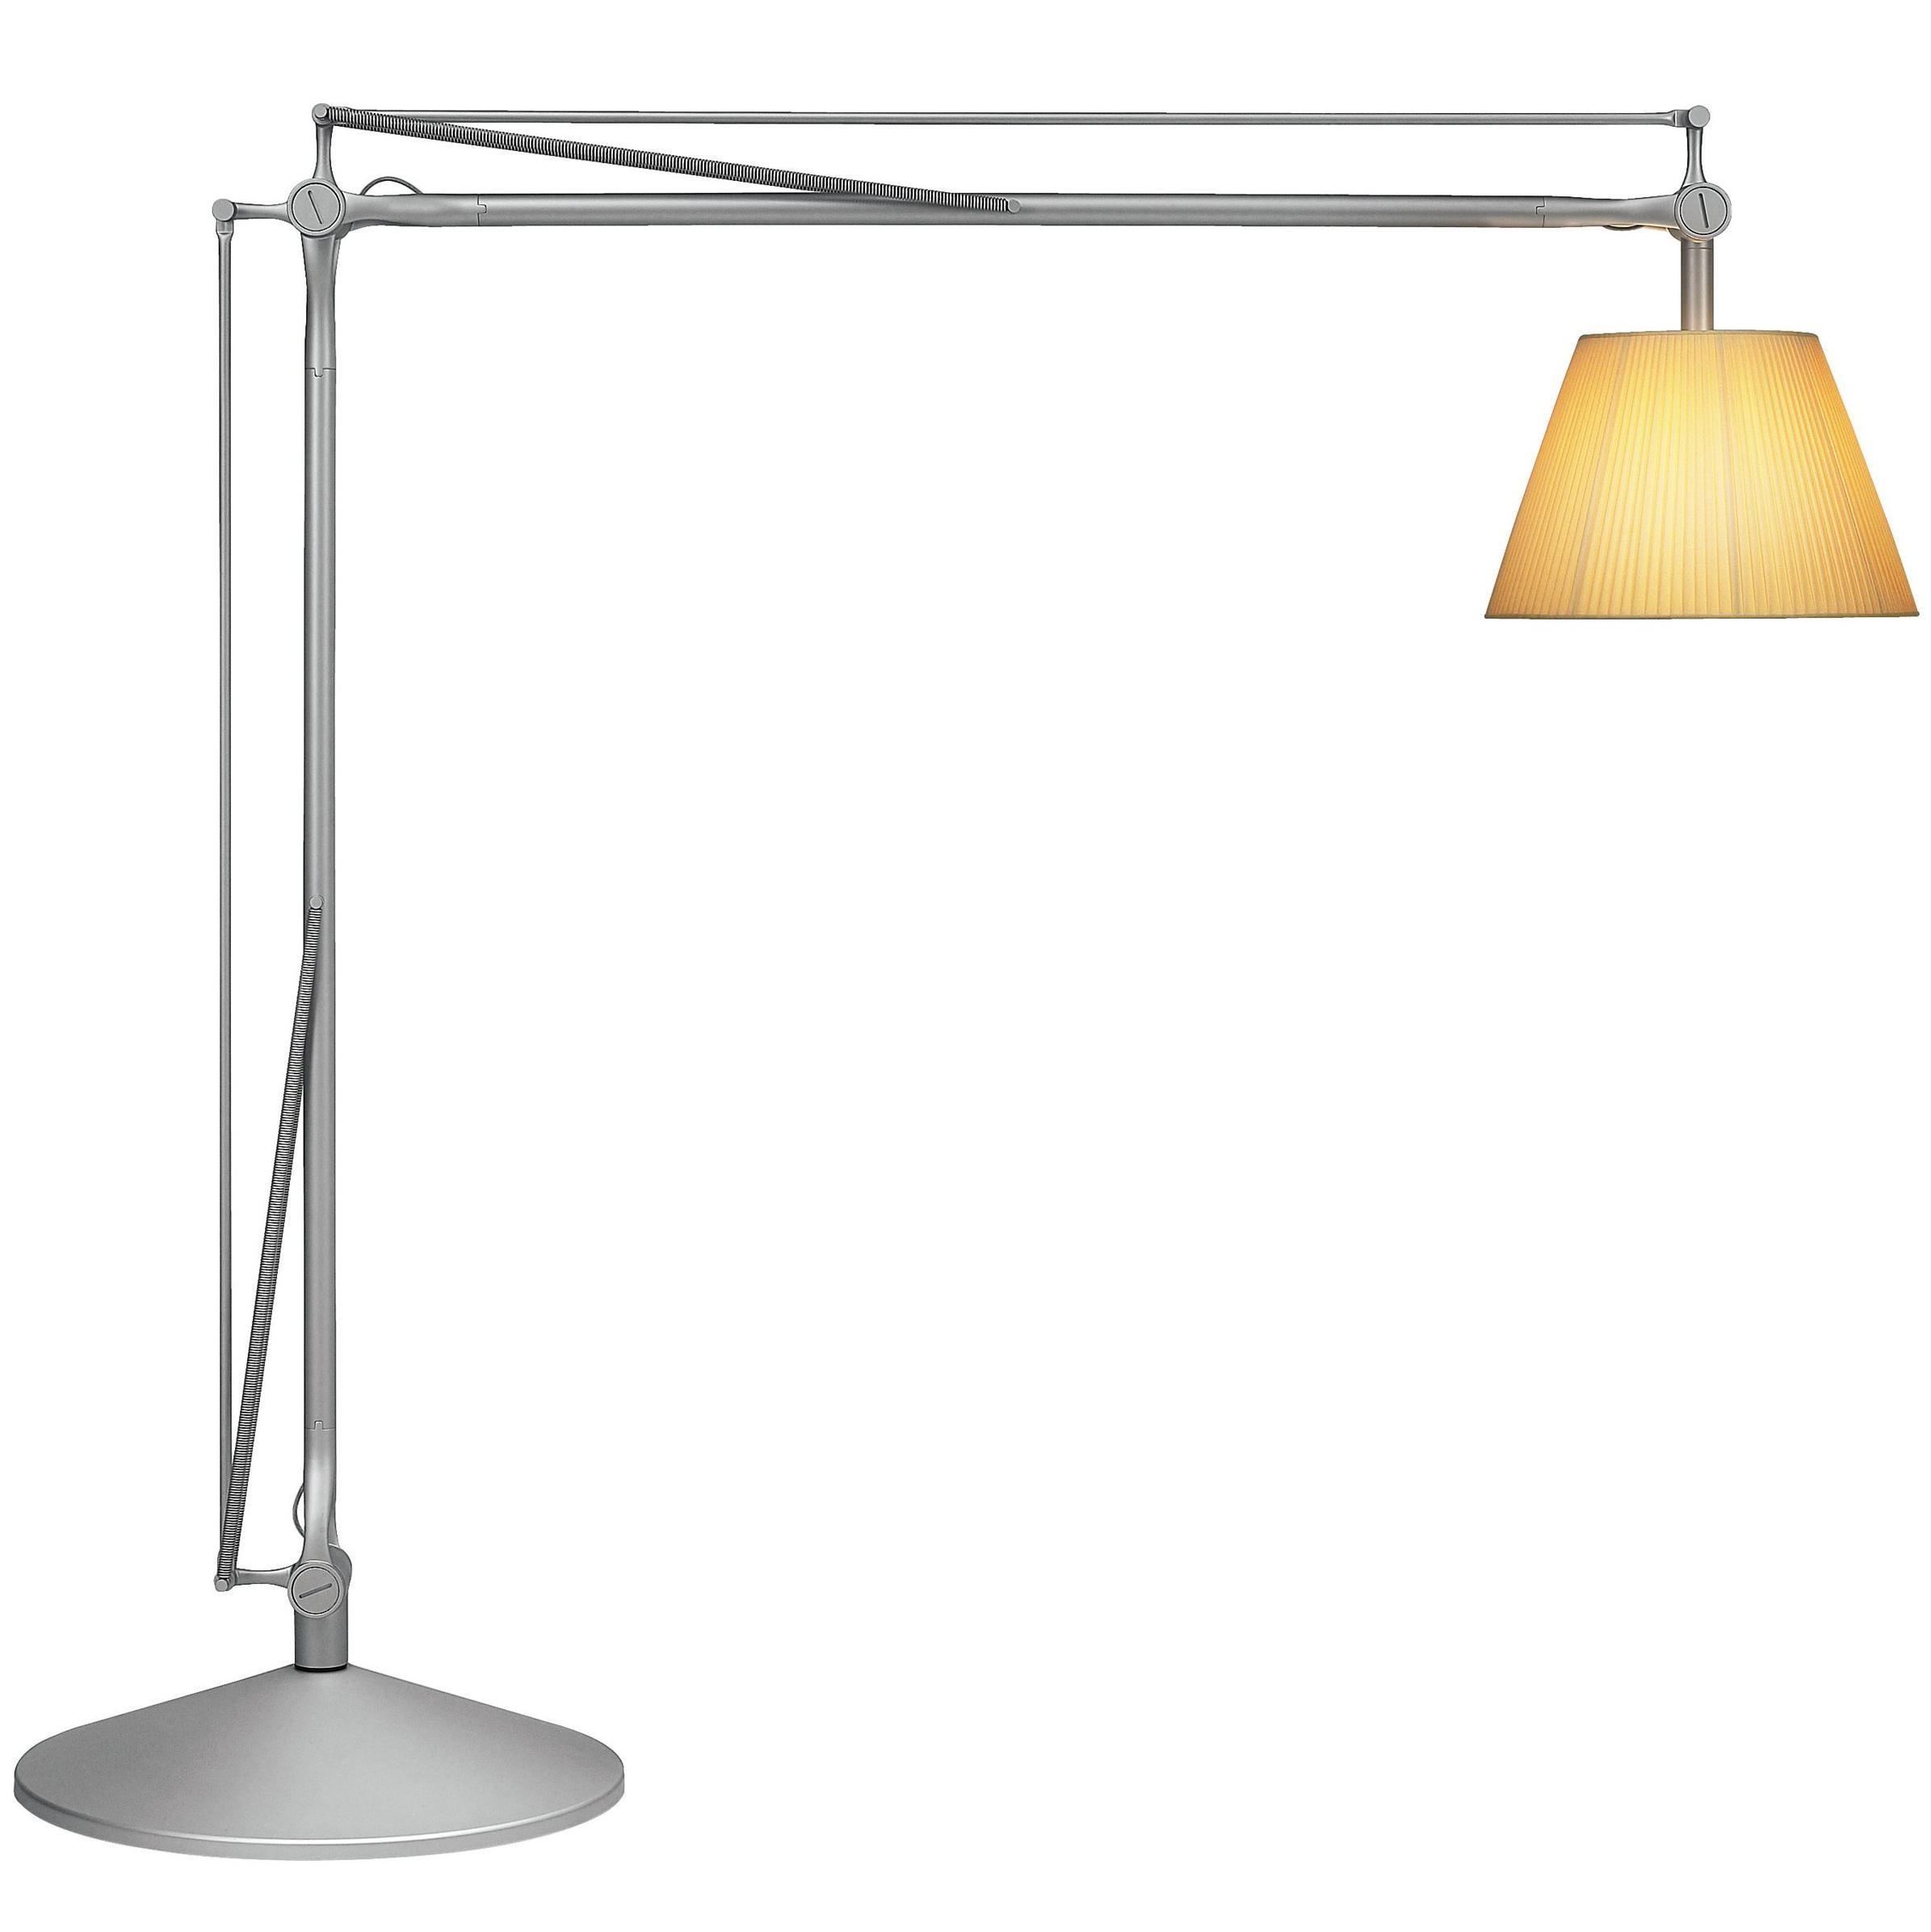 FLOS Superarchimoon Floor Lamp by Philippe Starck